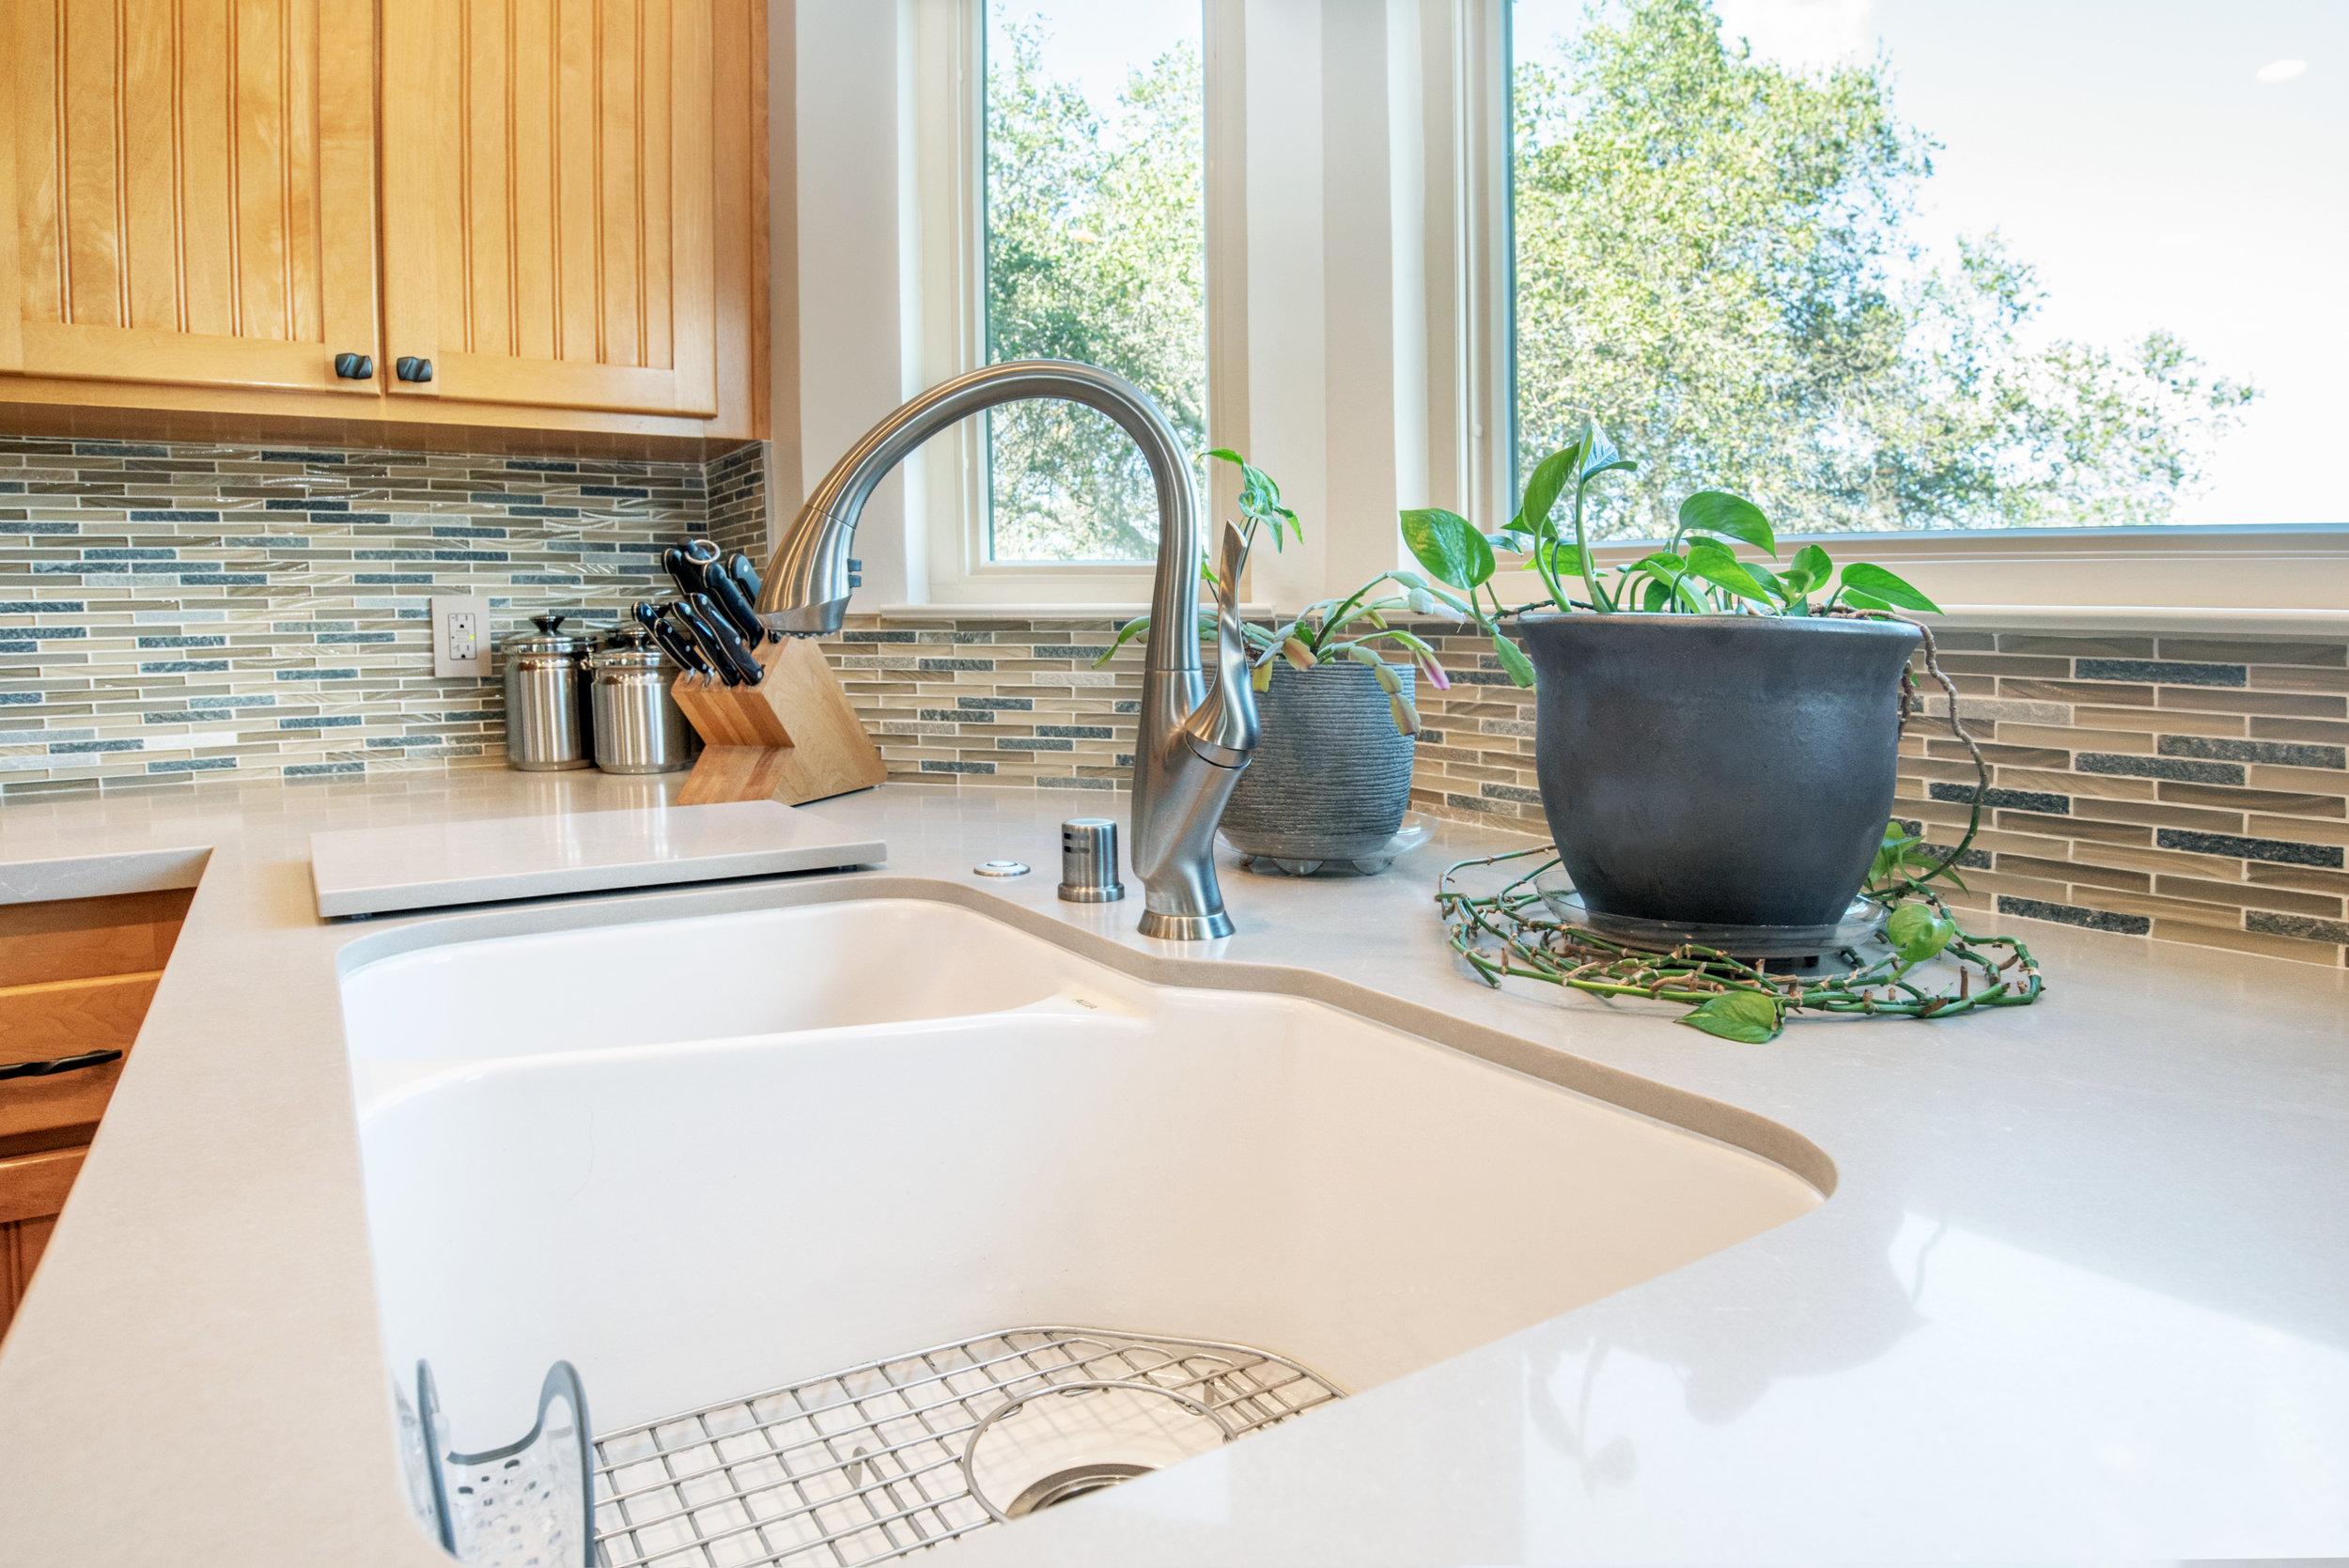 lafayette kitchen remodel tiel.jpg